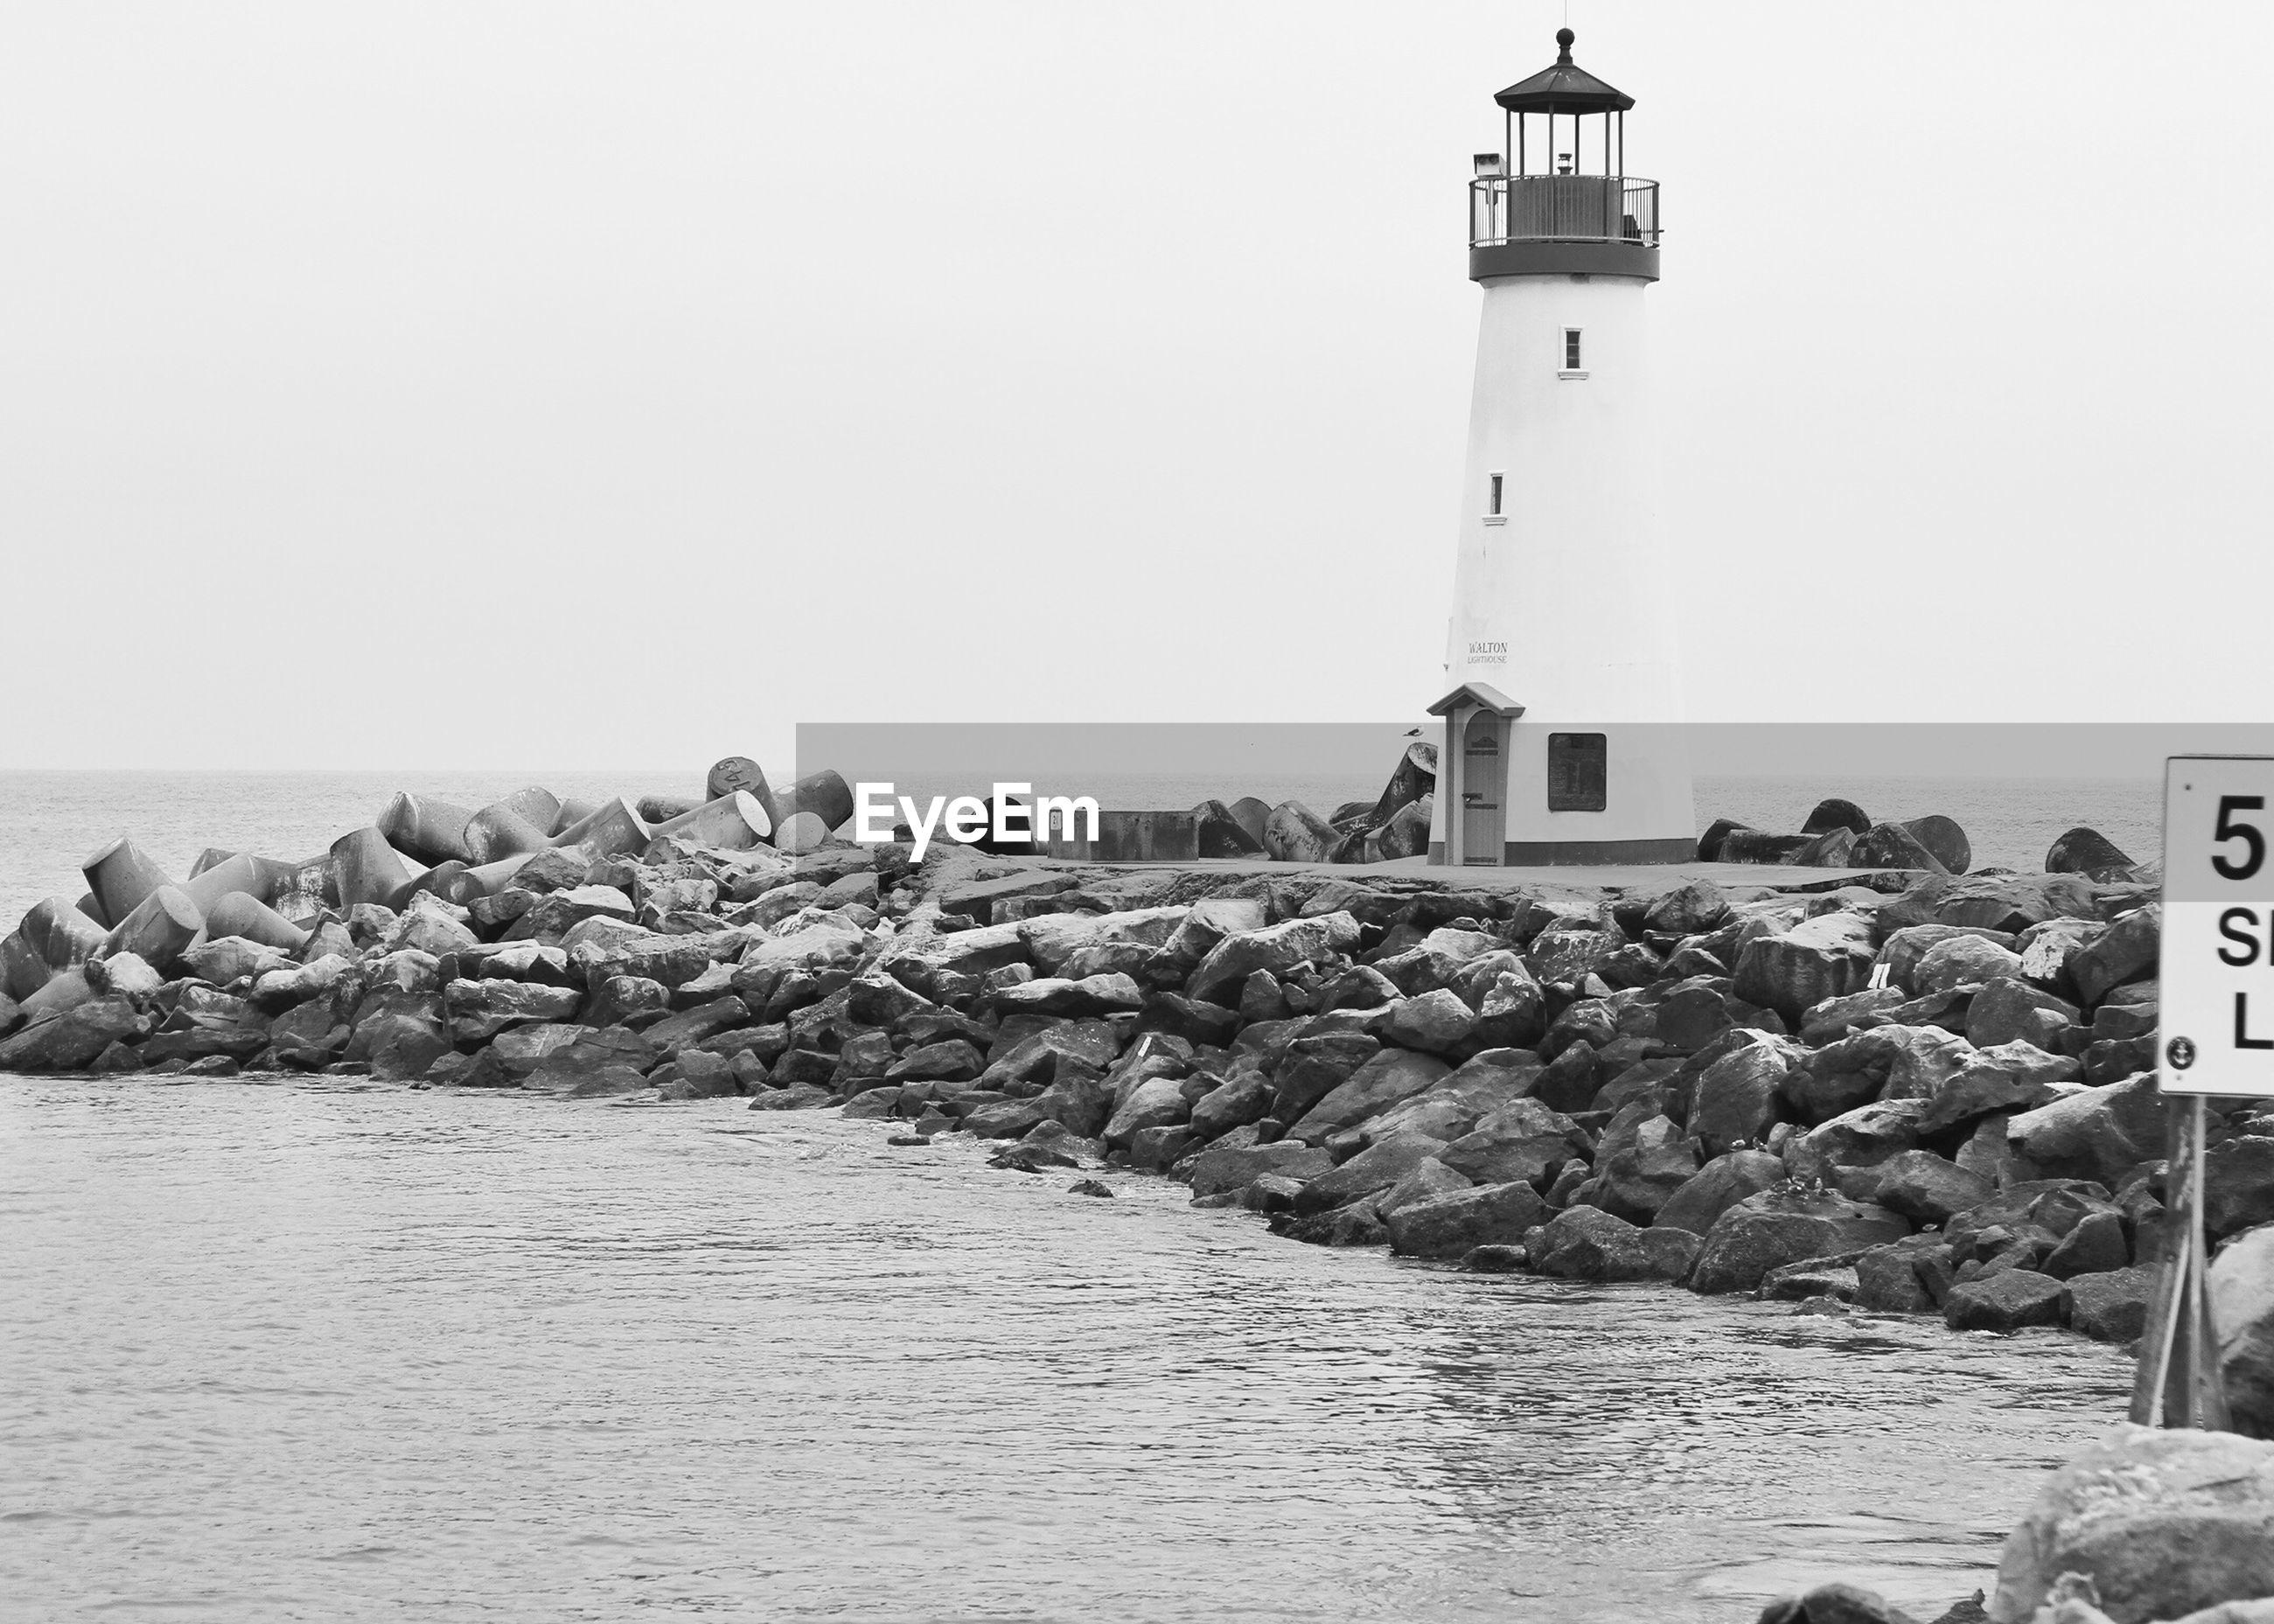 Lighthouse on stone jetty